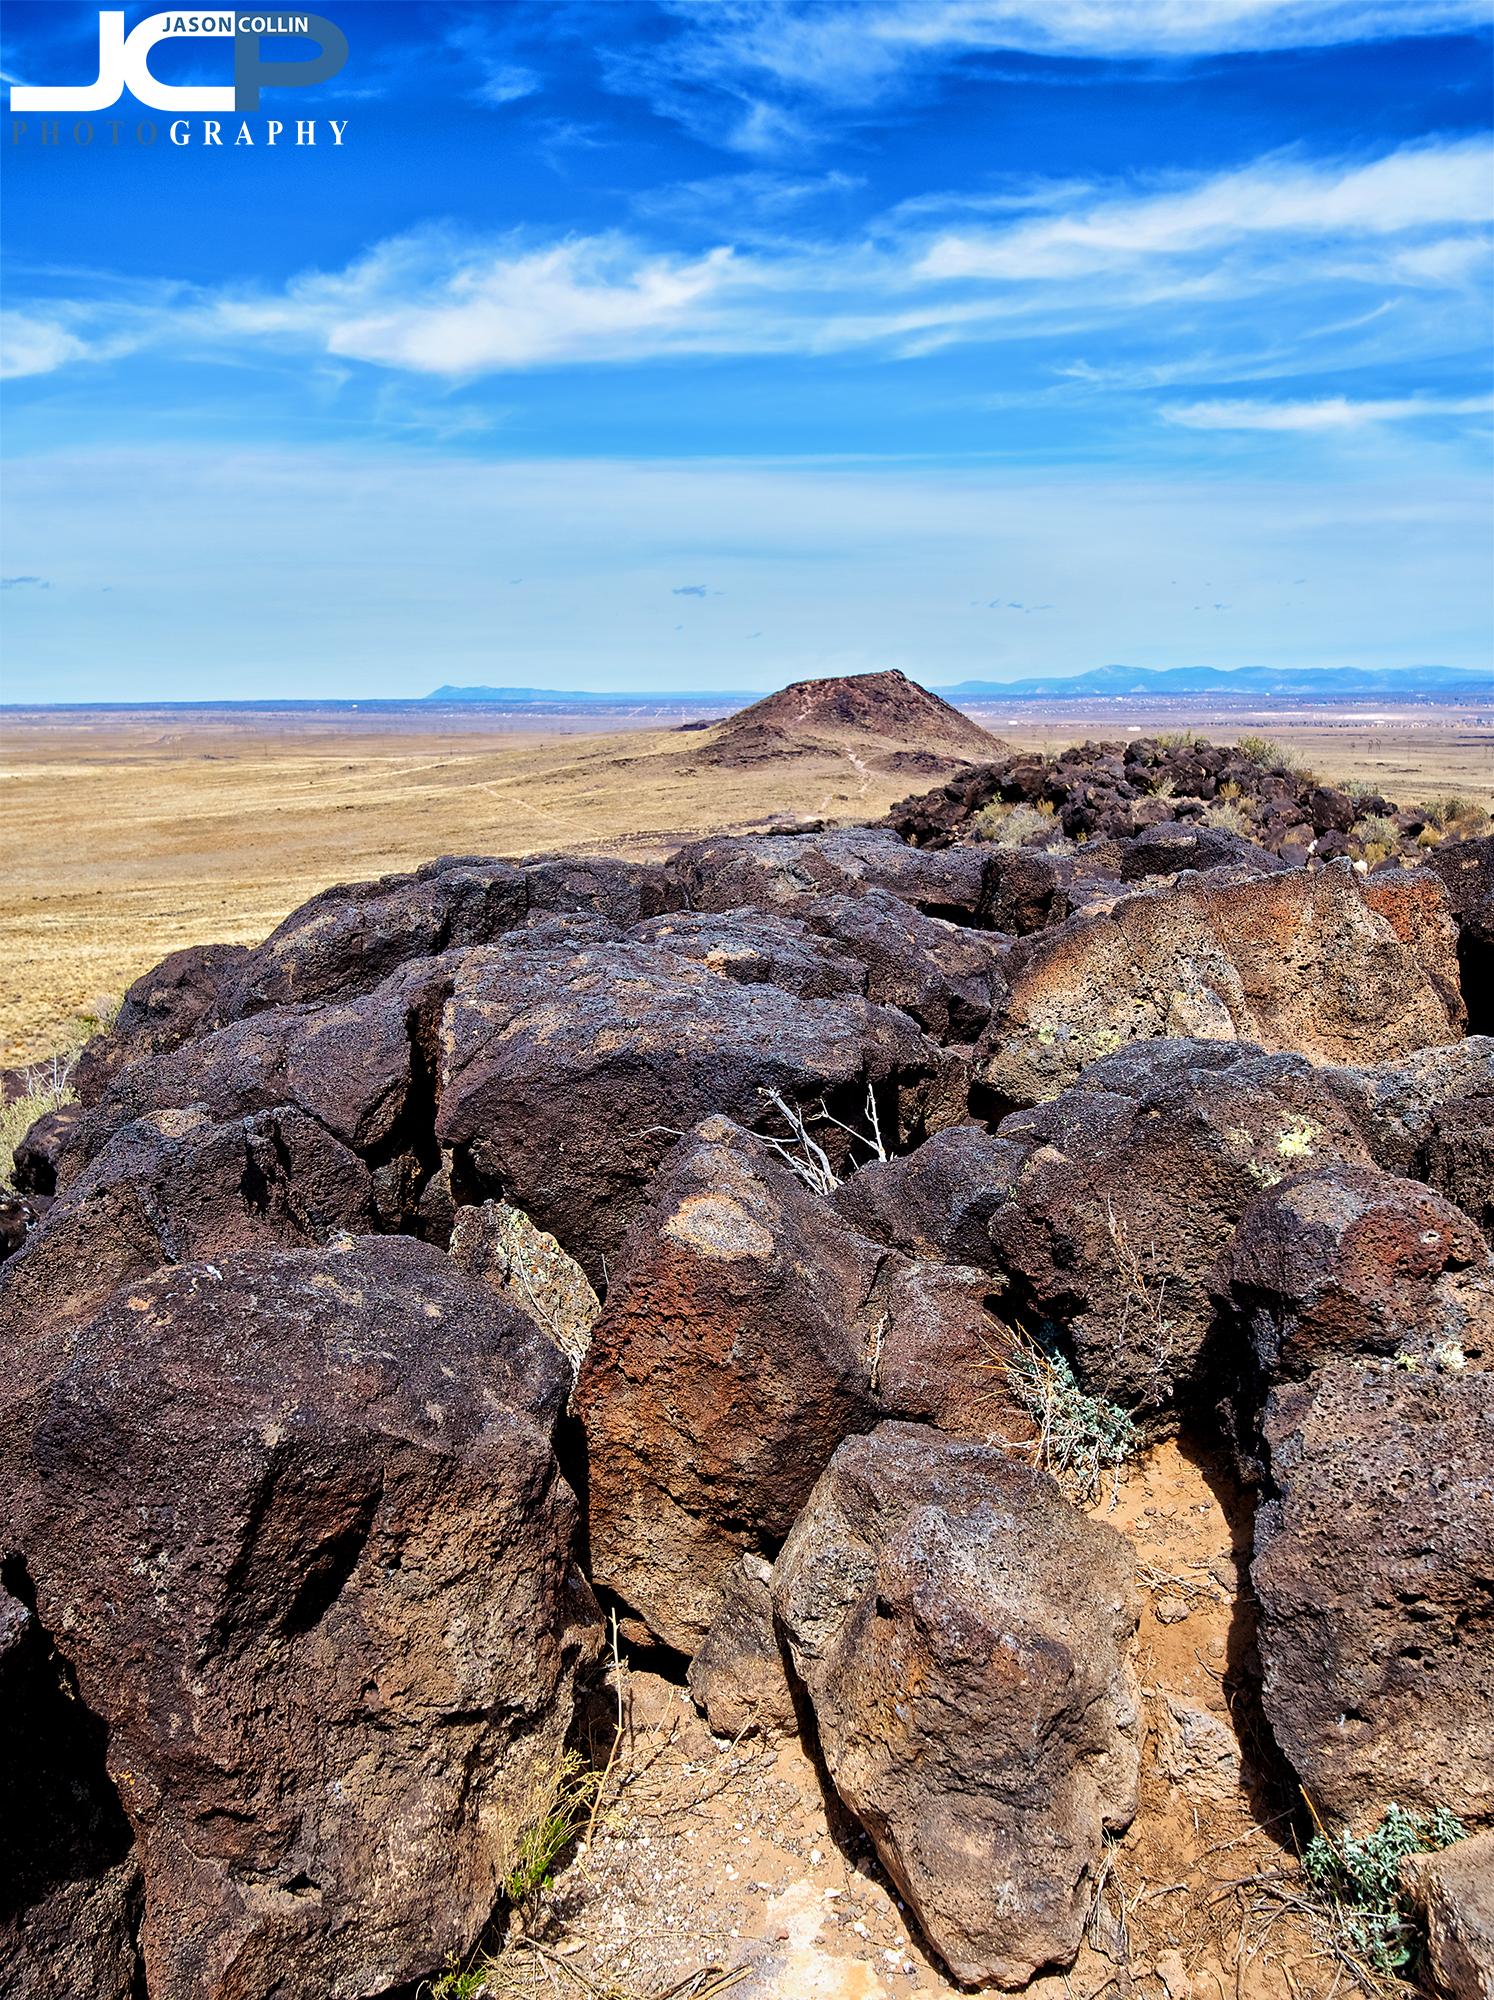 Atop Black Volcano at Petroglyphs in New Mexico - Nikon D750 with Tamron 15-30mm lens